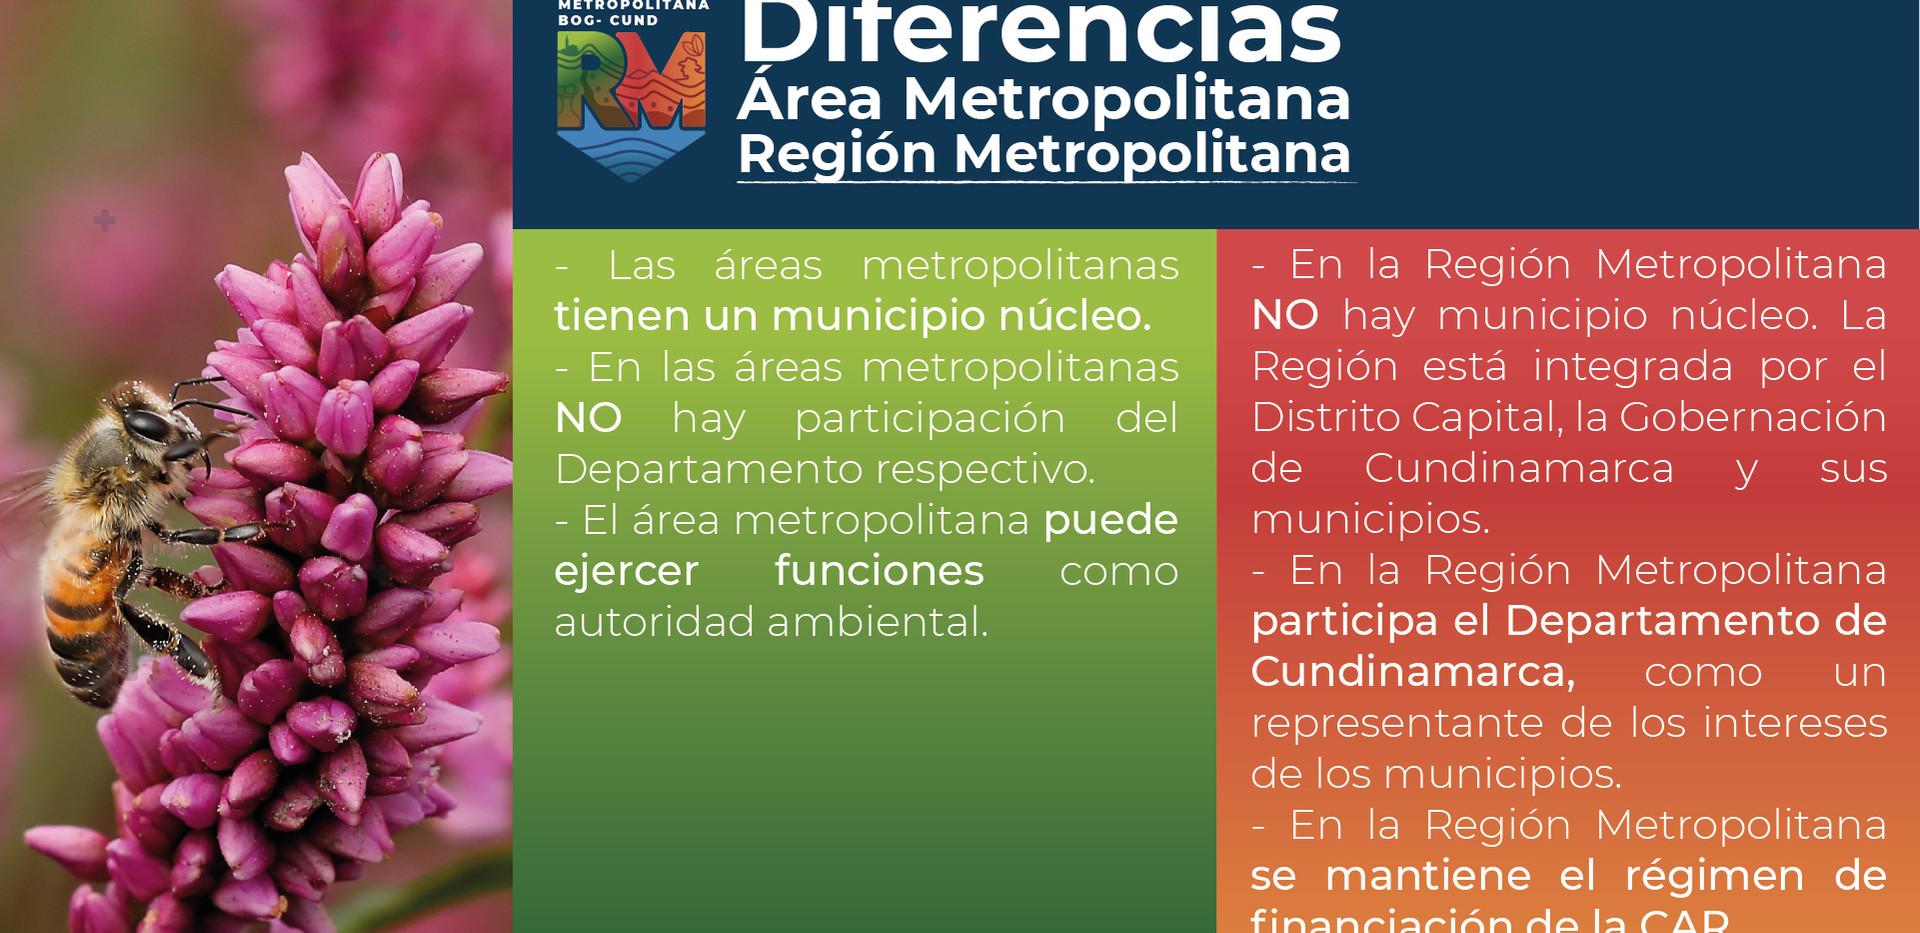 Diferencias Área Metropolitana - Región Metropolitana